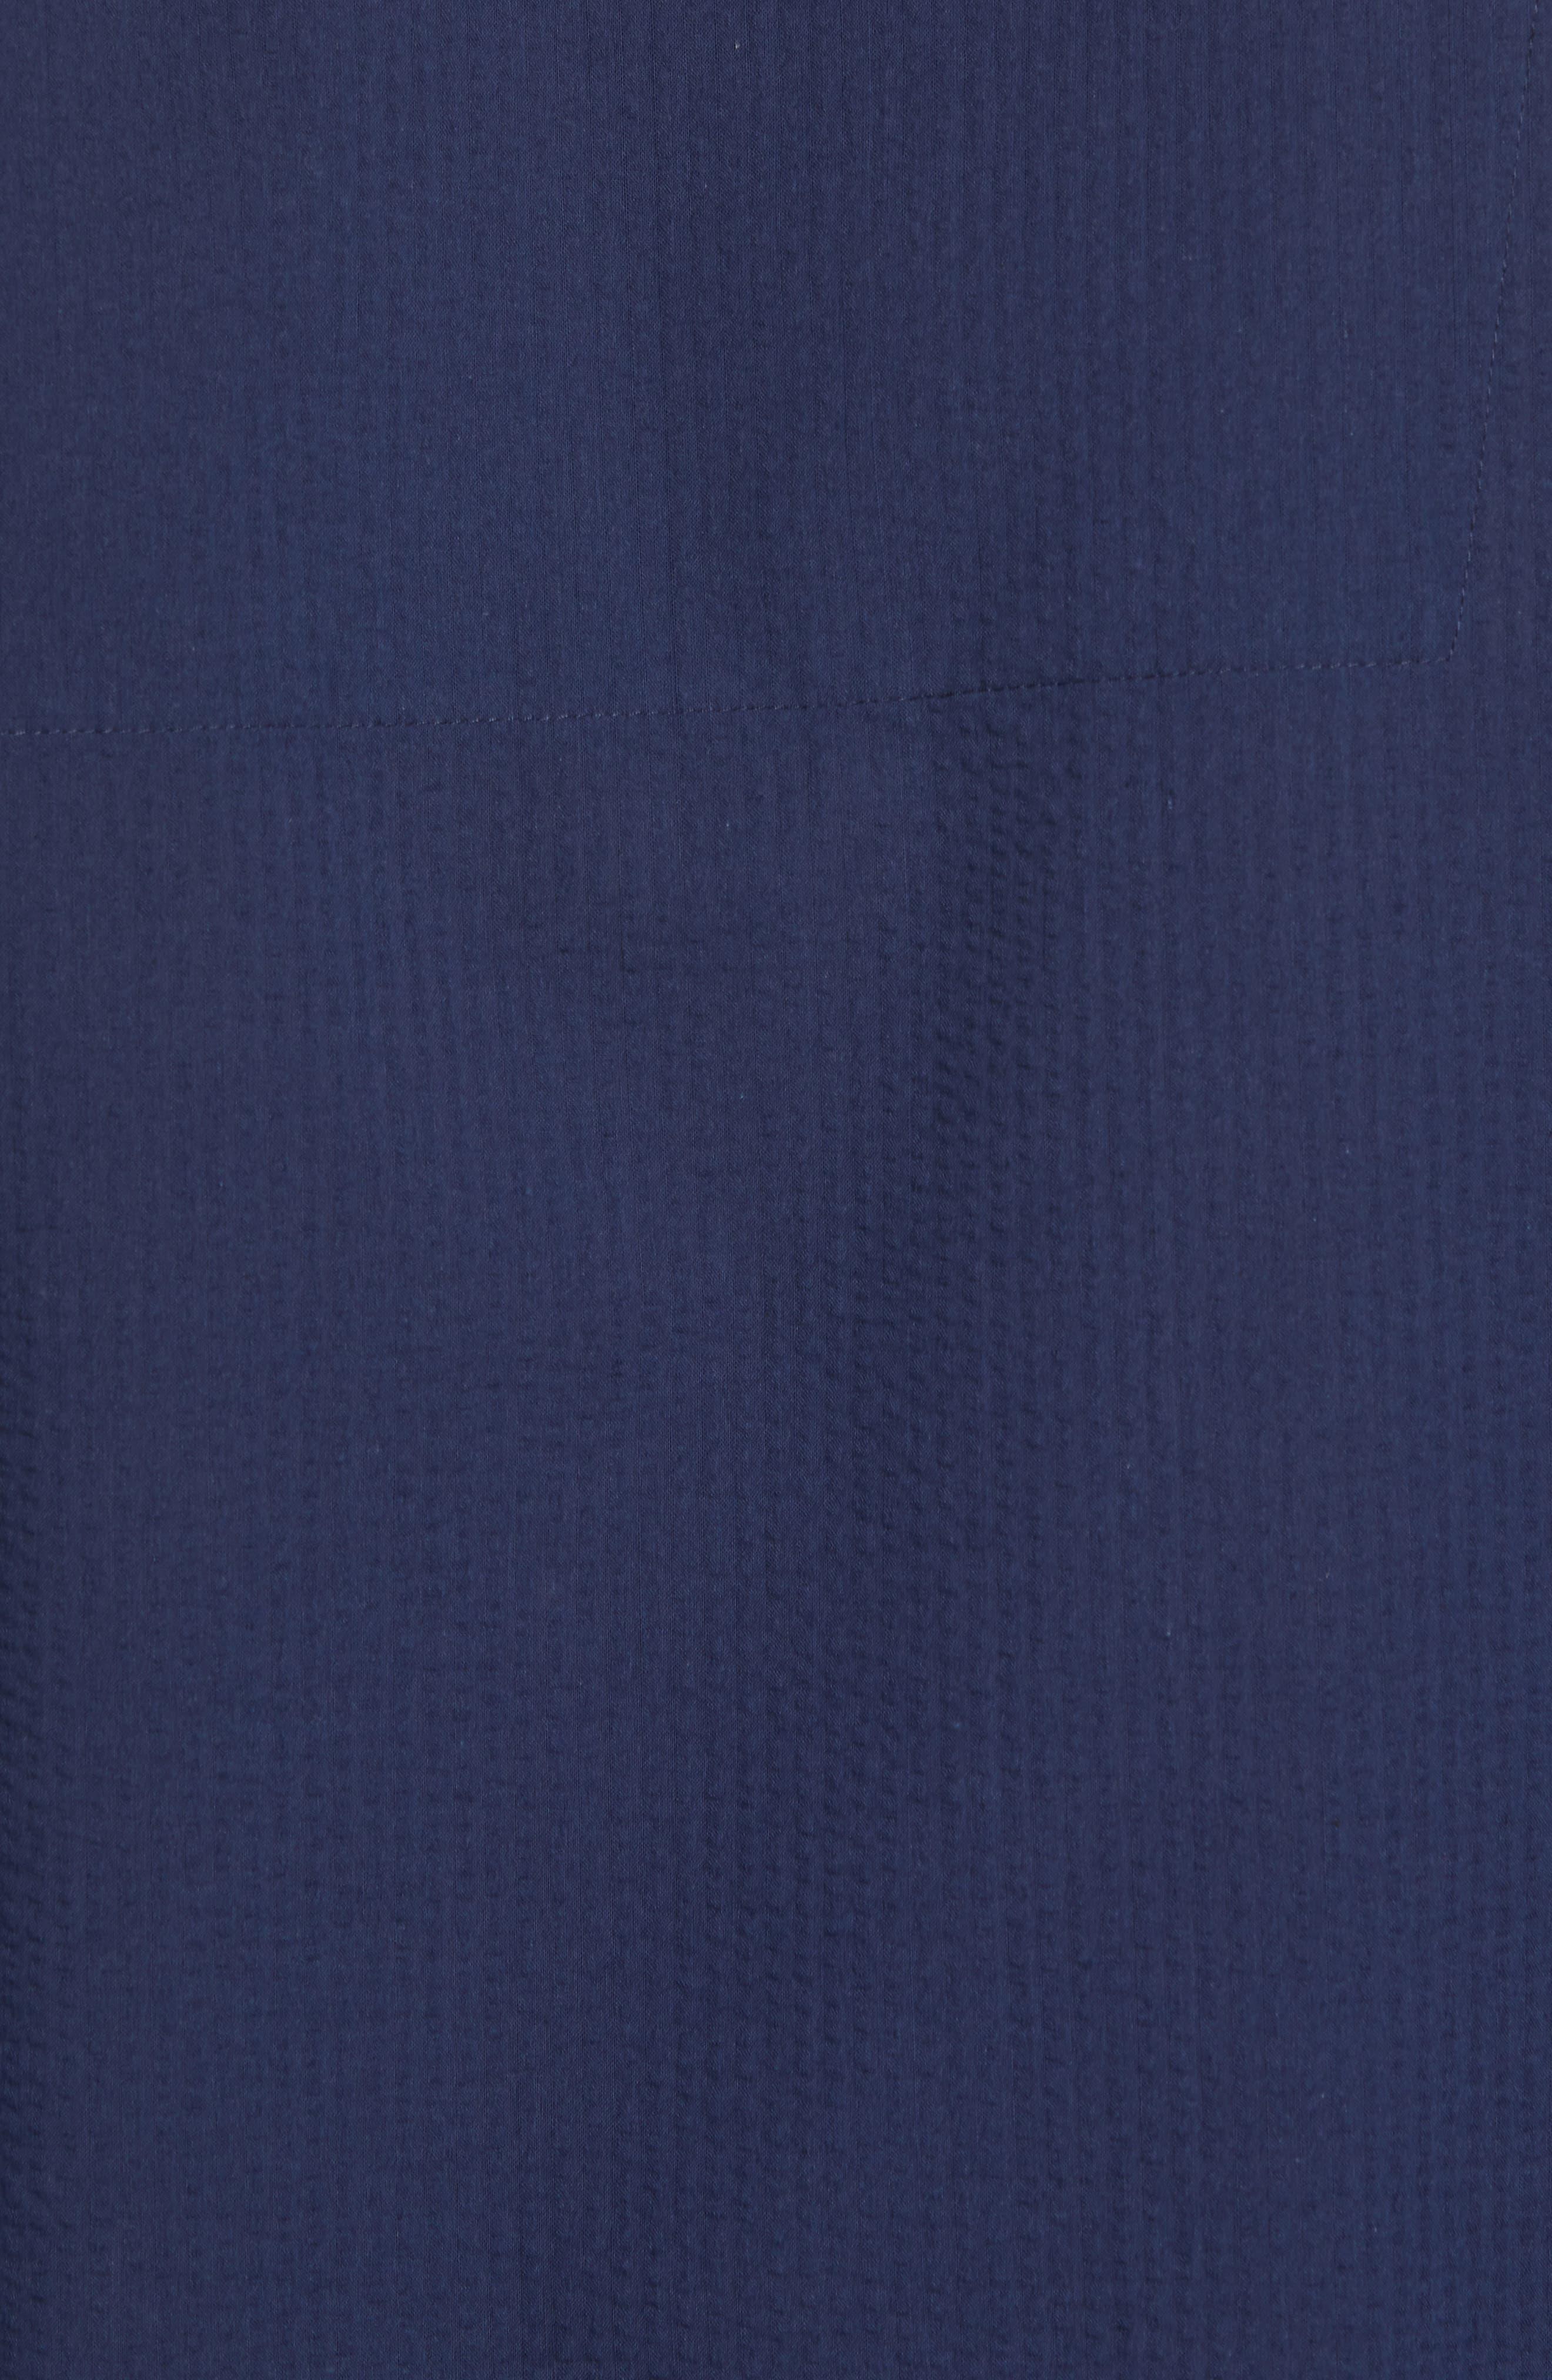 Seersucker Pajama Shirt,                             Alternate thumbnail 5, color,                             421